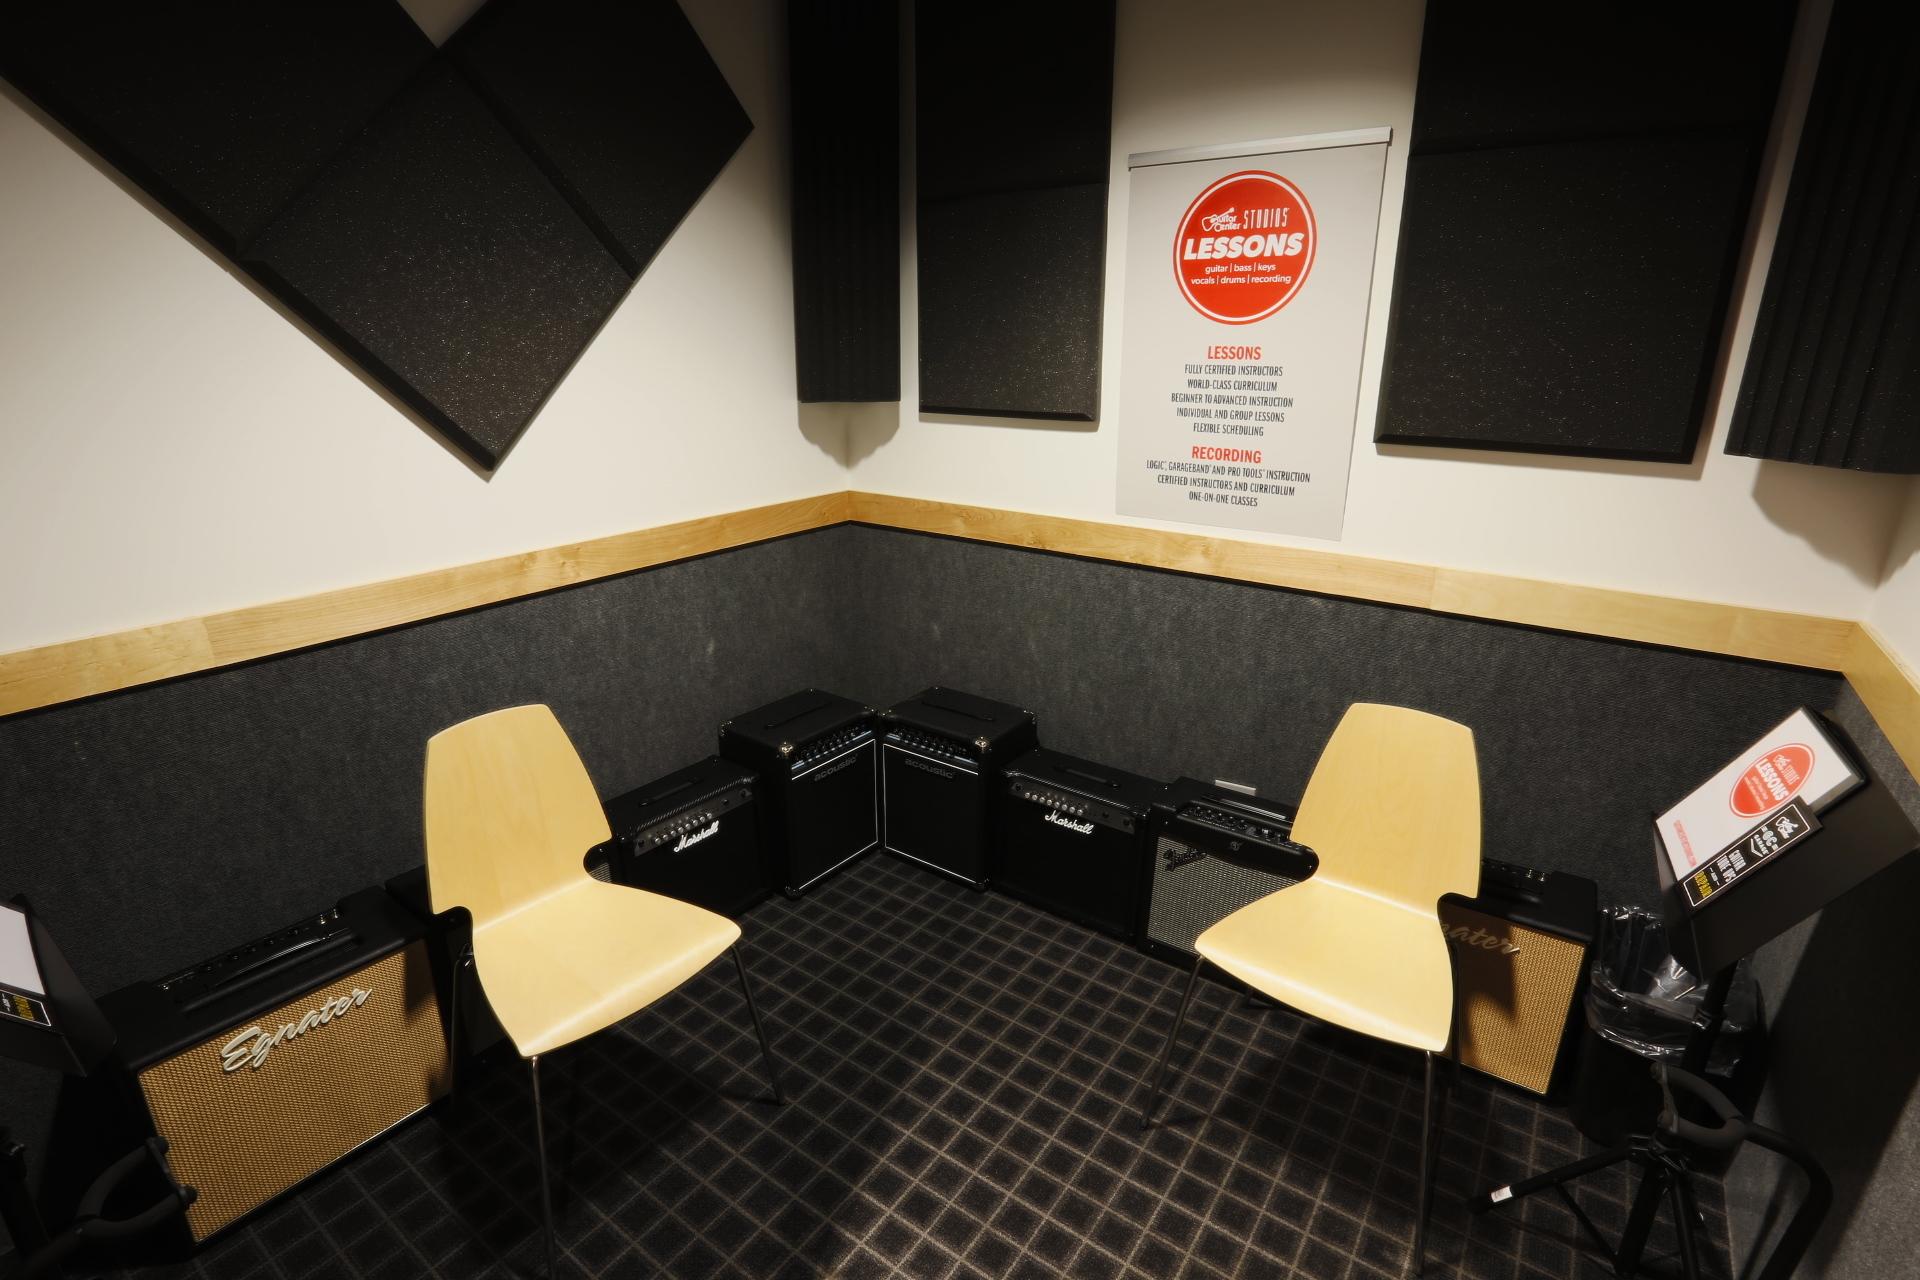 guitar center lessons shreveport louisiana la. Black Bedroom Furniture Sets. Home Design Ideas